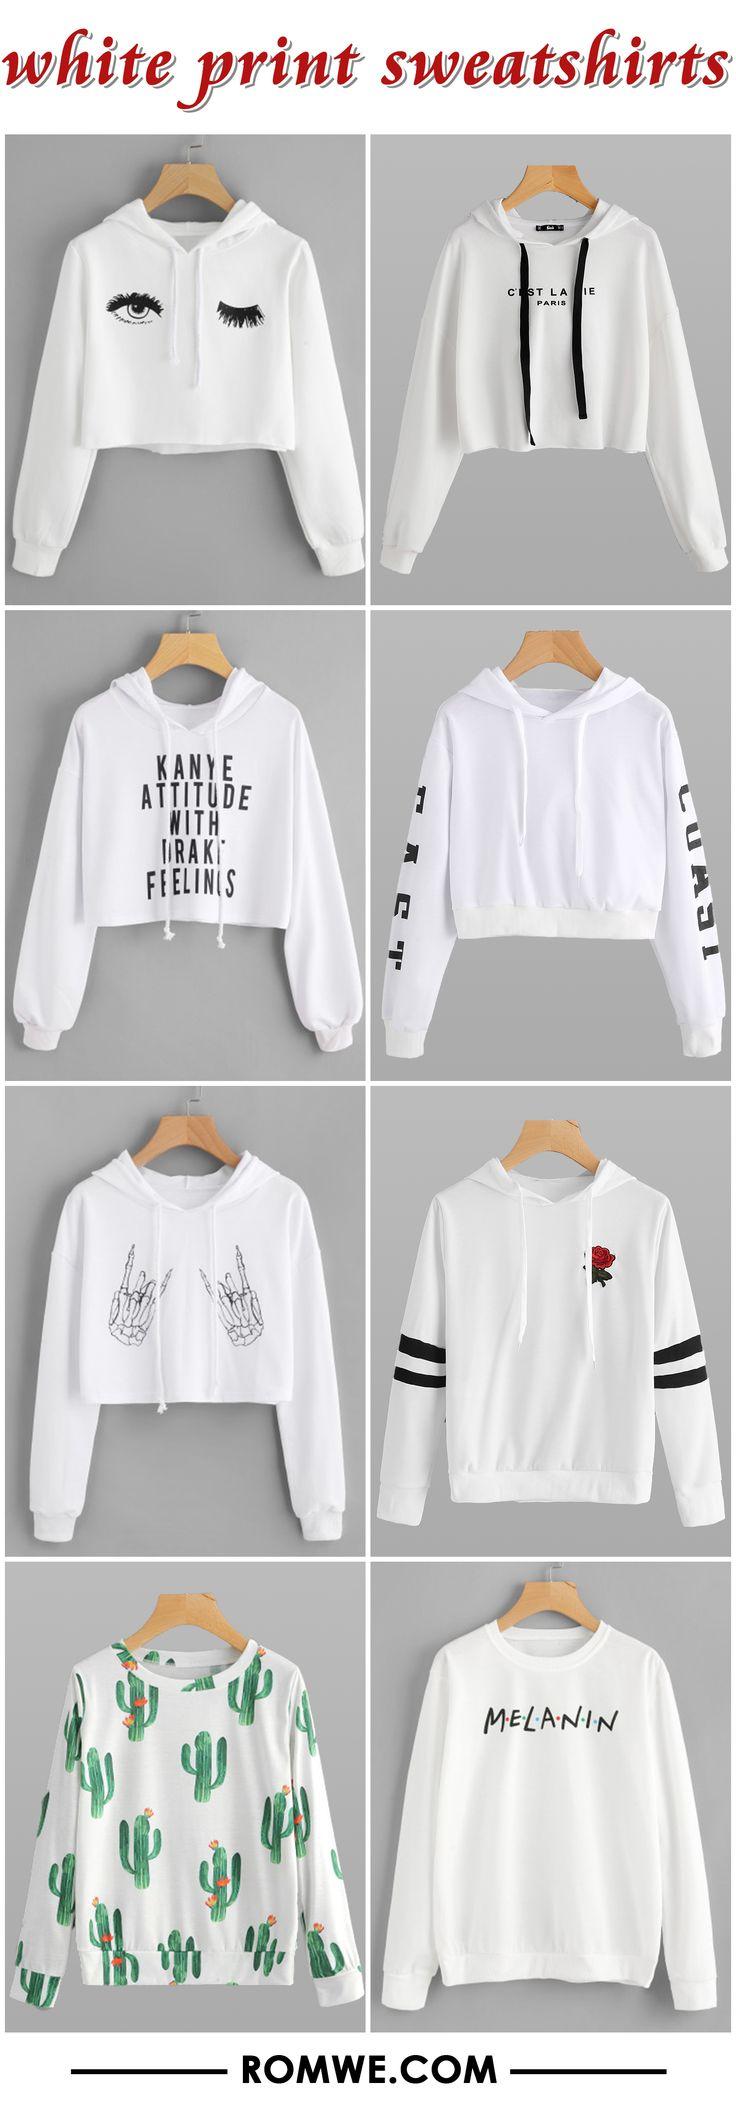 white print sweatshirts from romwe.com